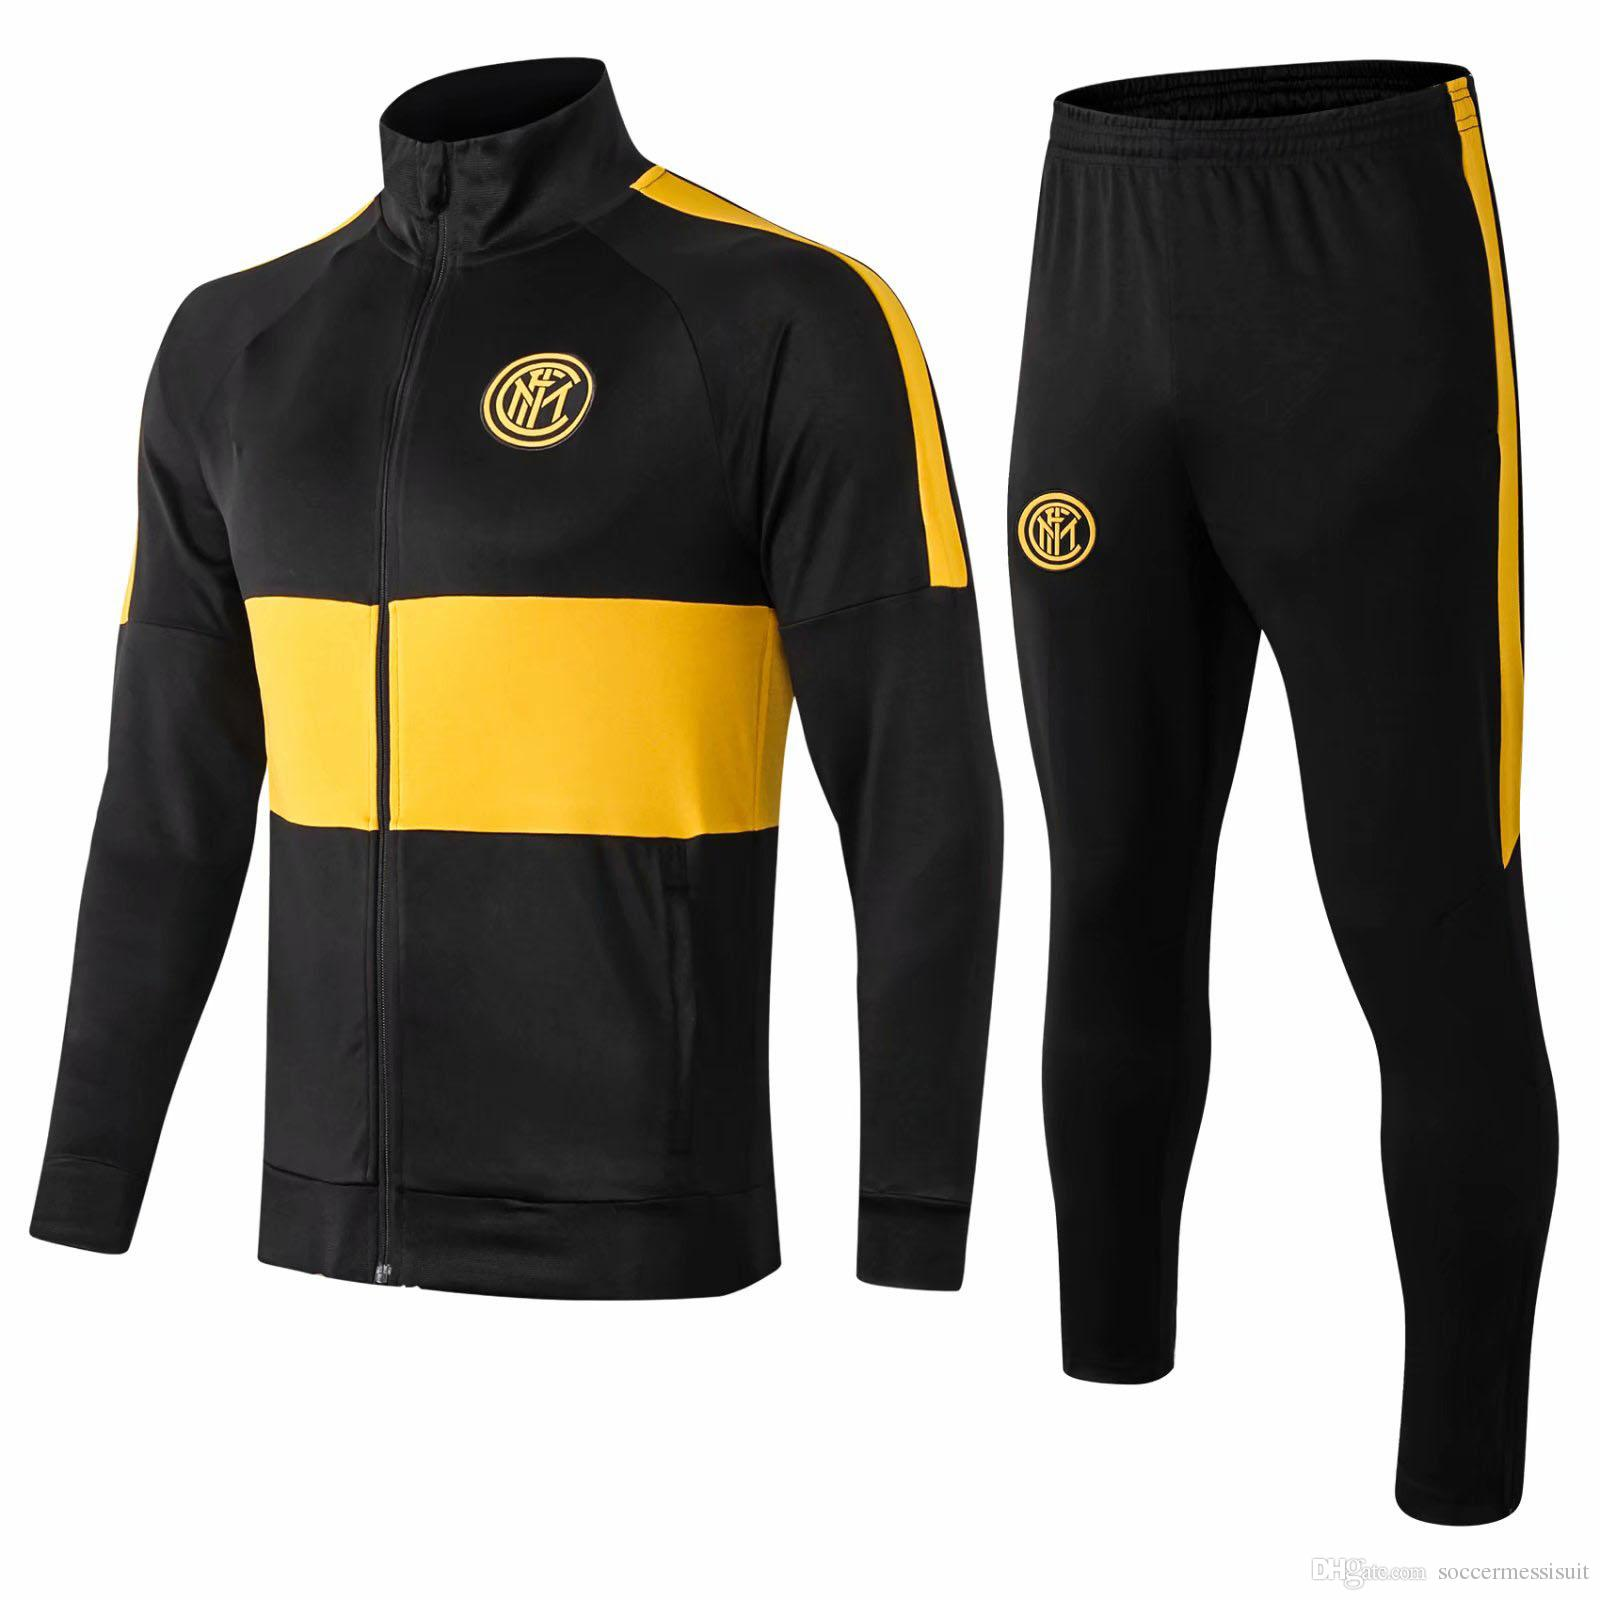 19 20 top qualidade Inter jaquetas de terno terno ICARDI camisas de futebol NAINGGOLAN RAFINHA futebol Sportswear LAUTARO jaqueta de treinamento terno